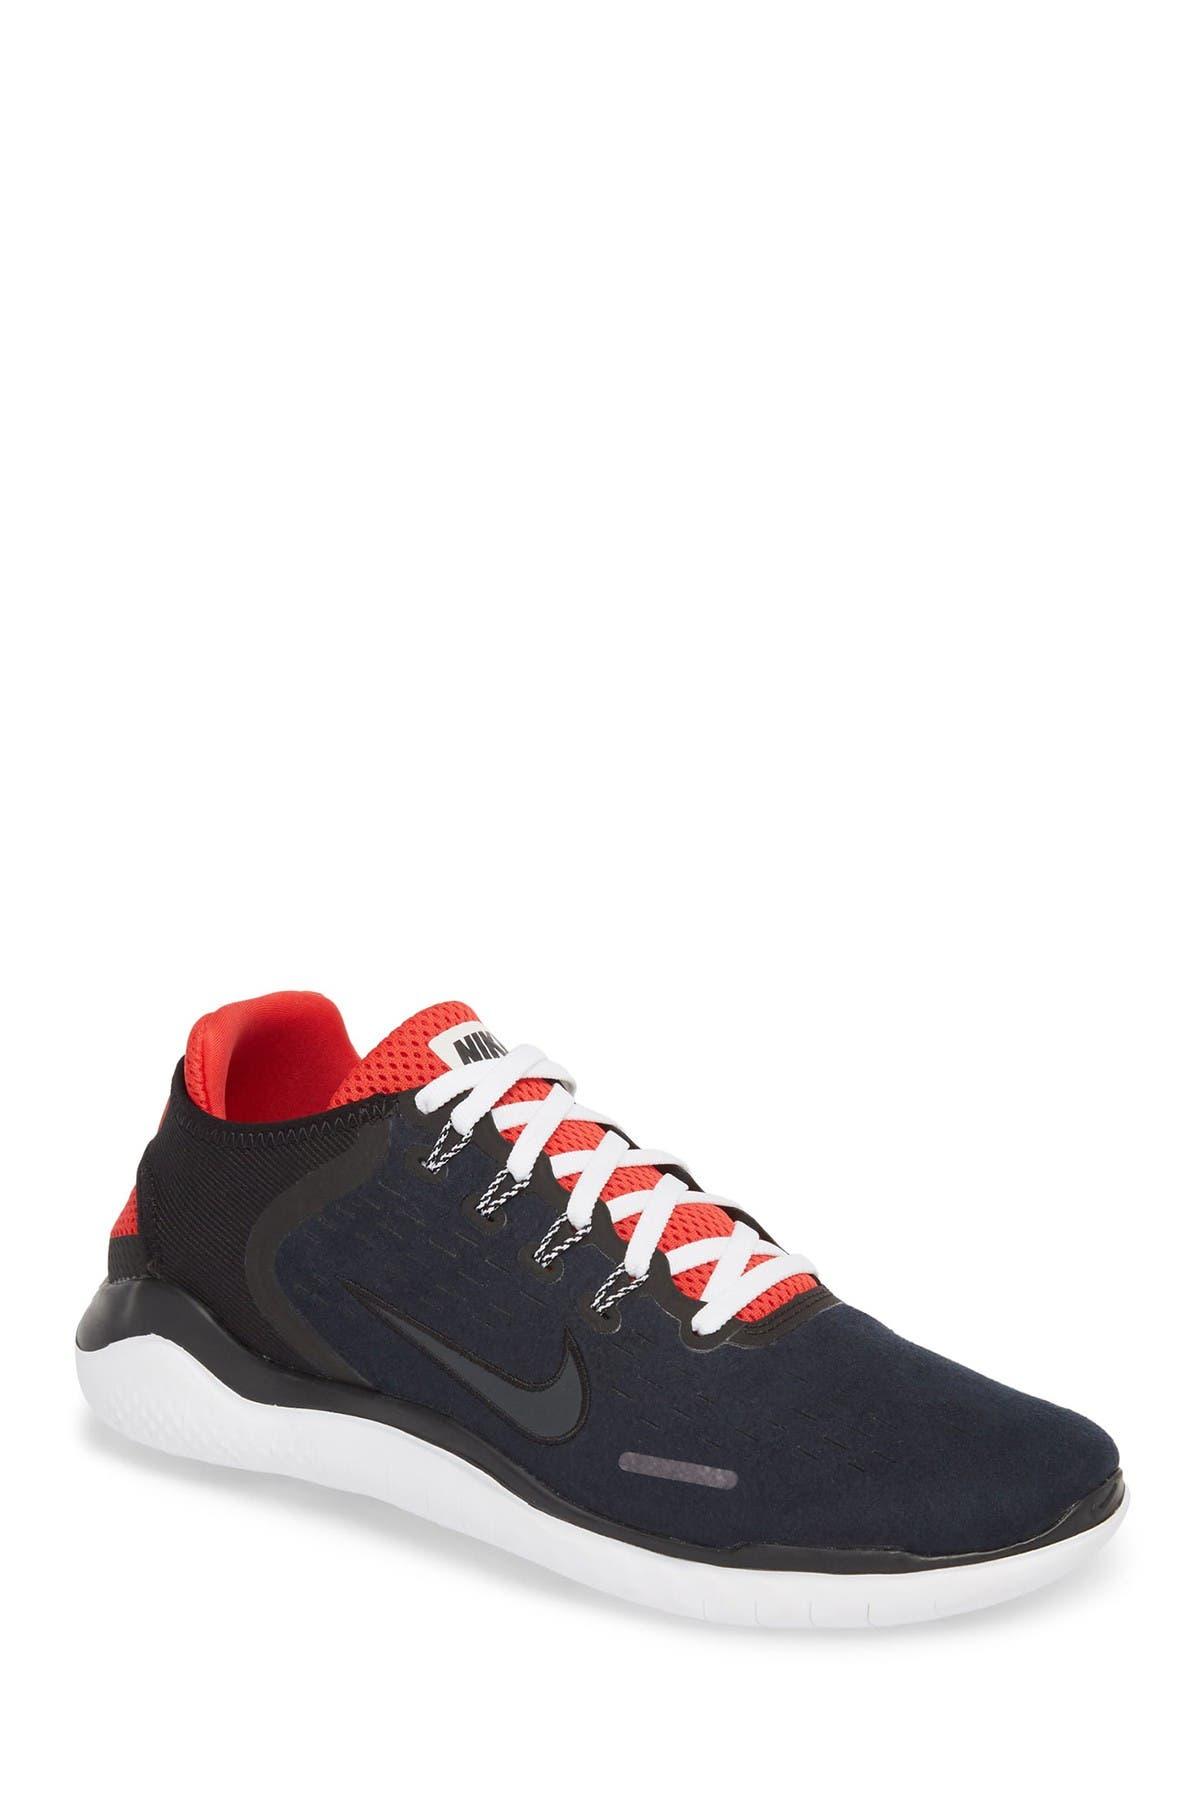 Nike | Free RN 2018 DNA Running Sneaker